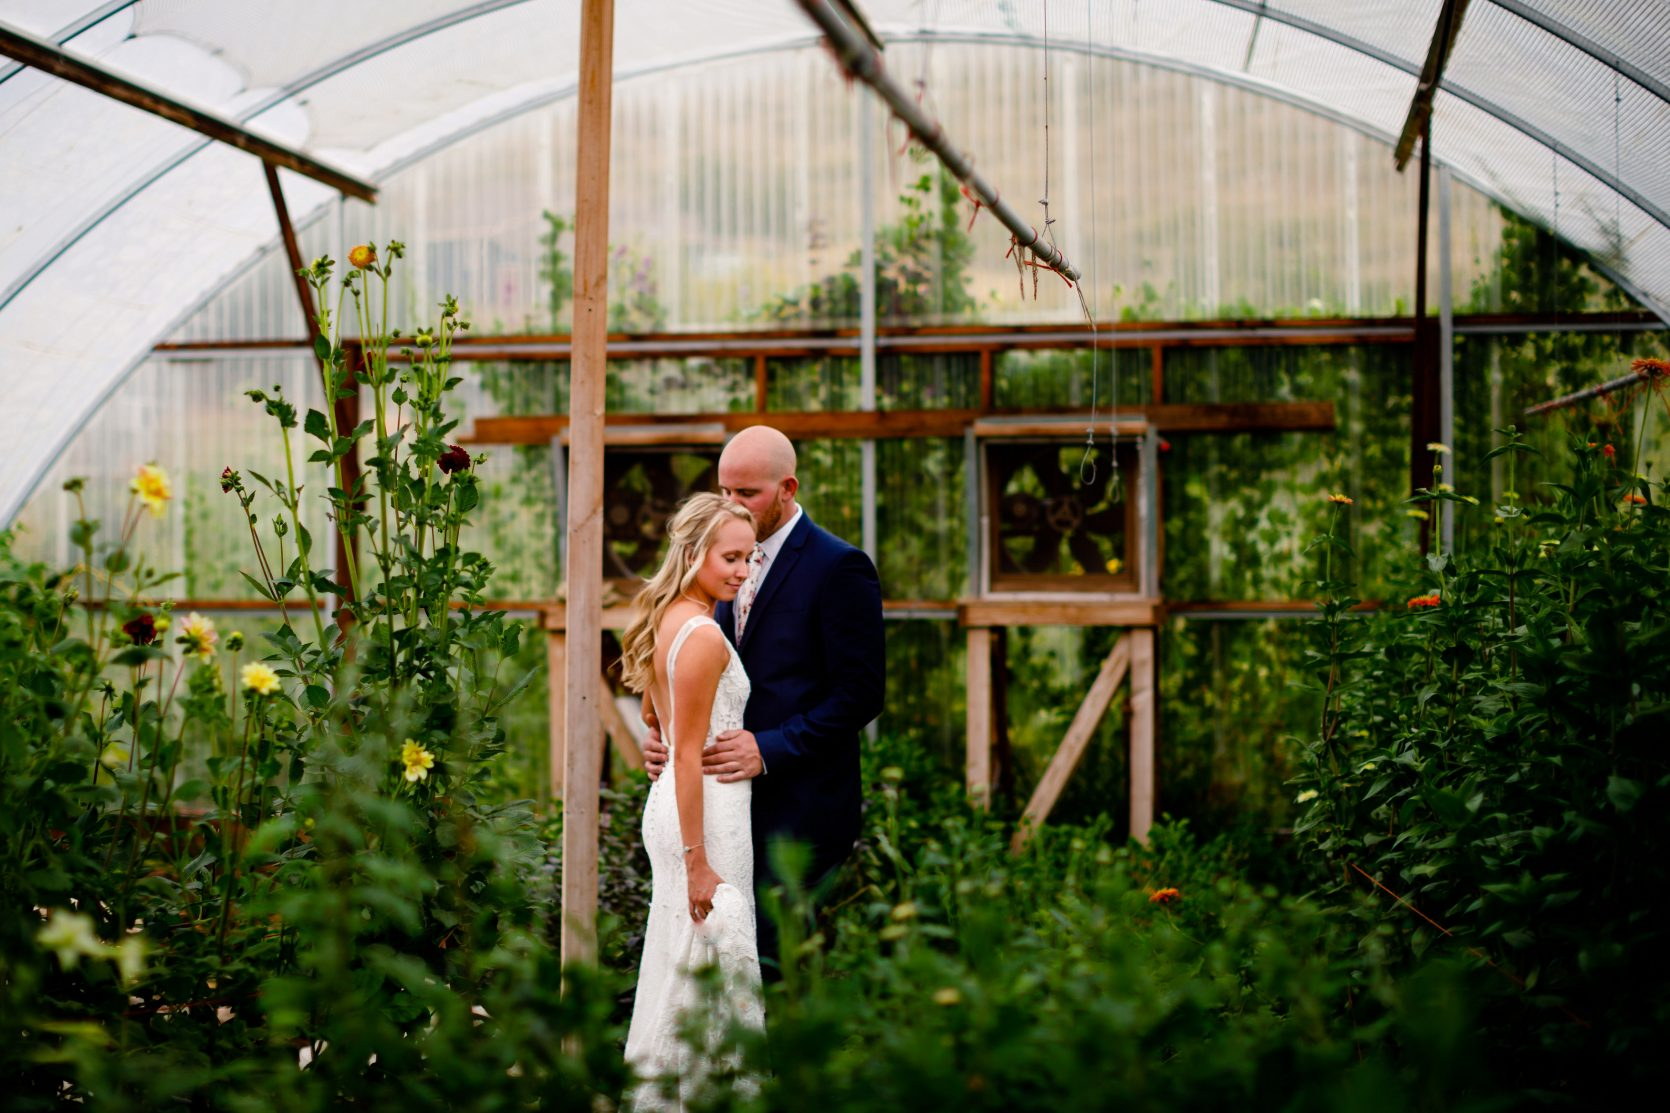 Lyons_Farmette_Wedding_0042-1670x1113.jpg